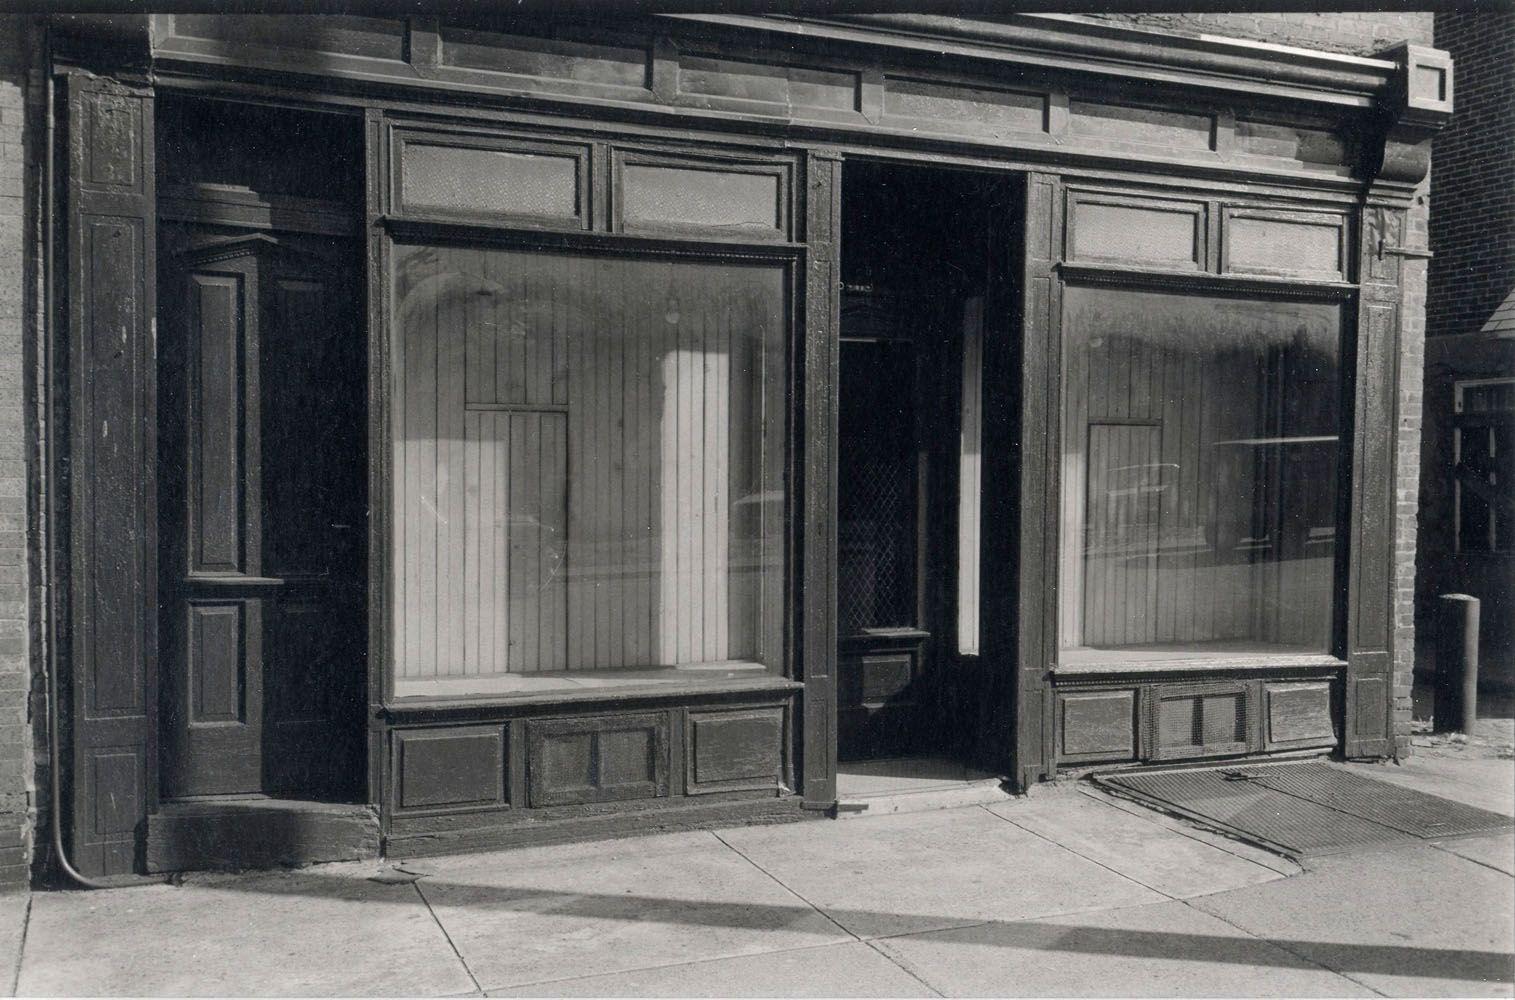 Will Brown  Bainbridge & Orianna St, Philadelphia 1972